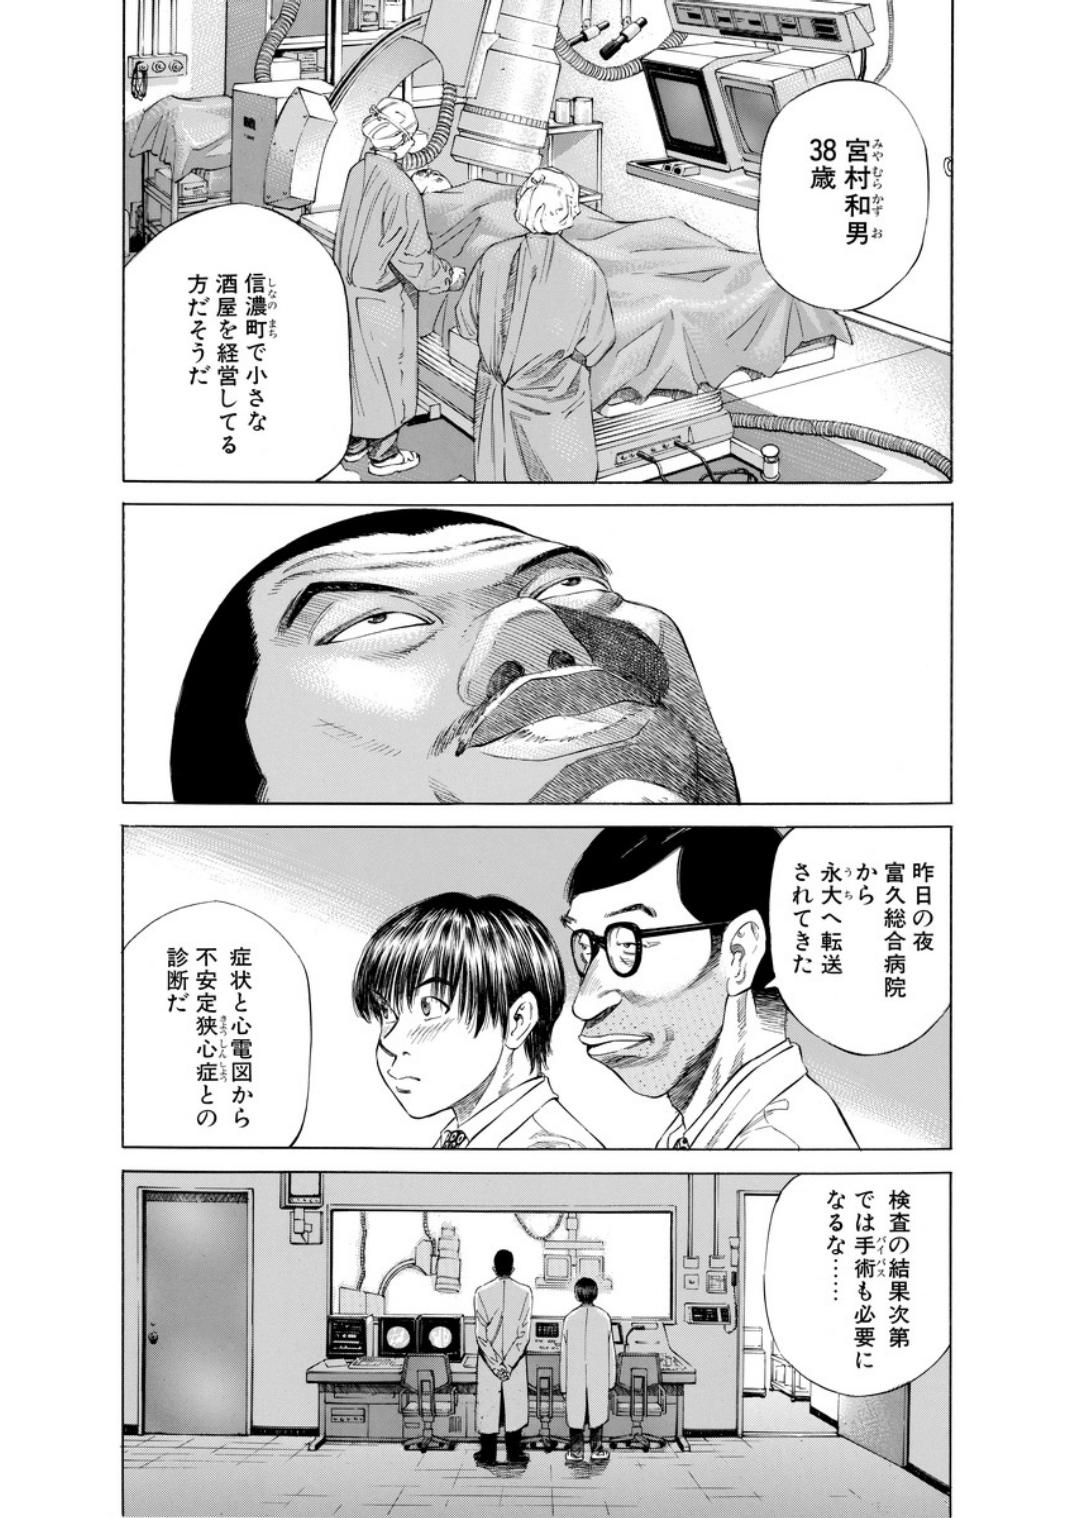 001bj_page-0167.jpg